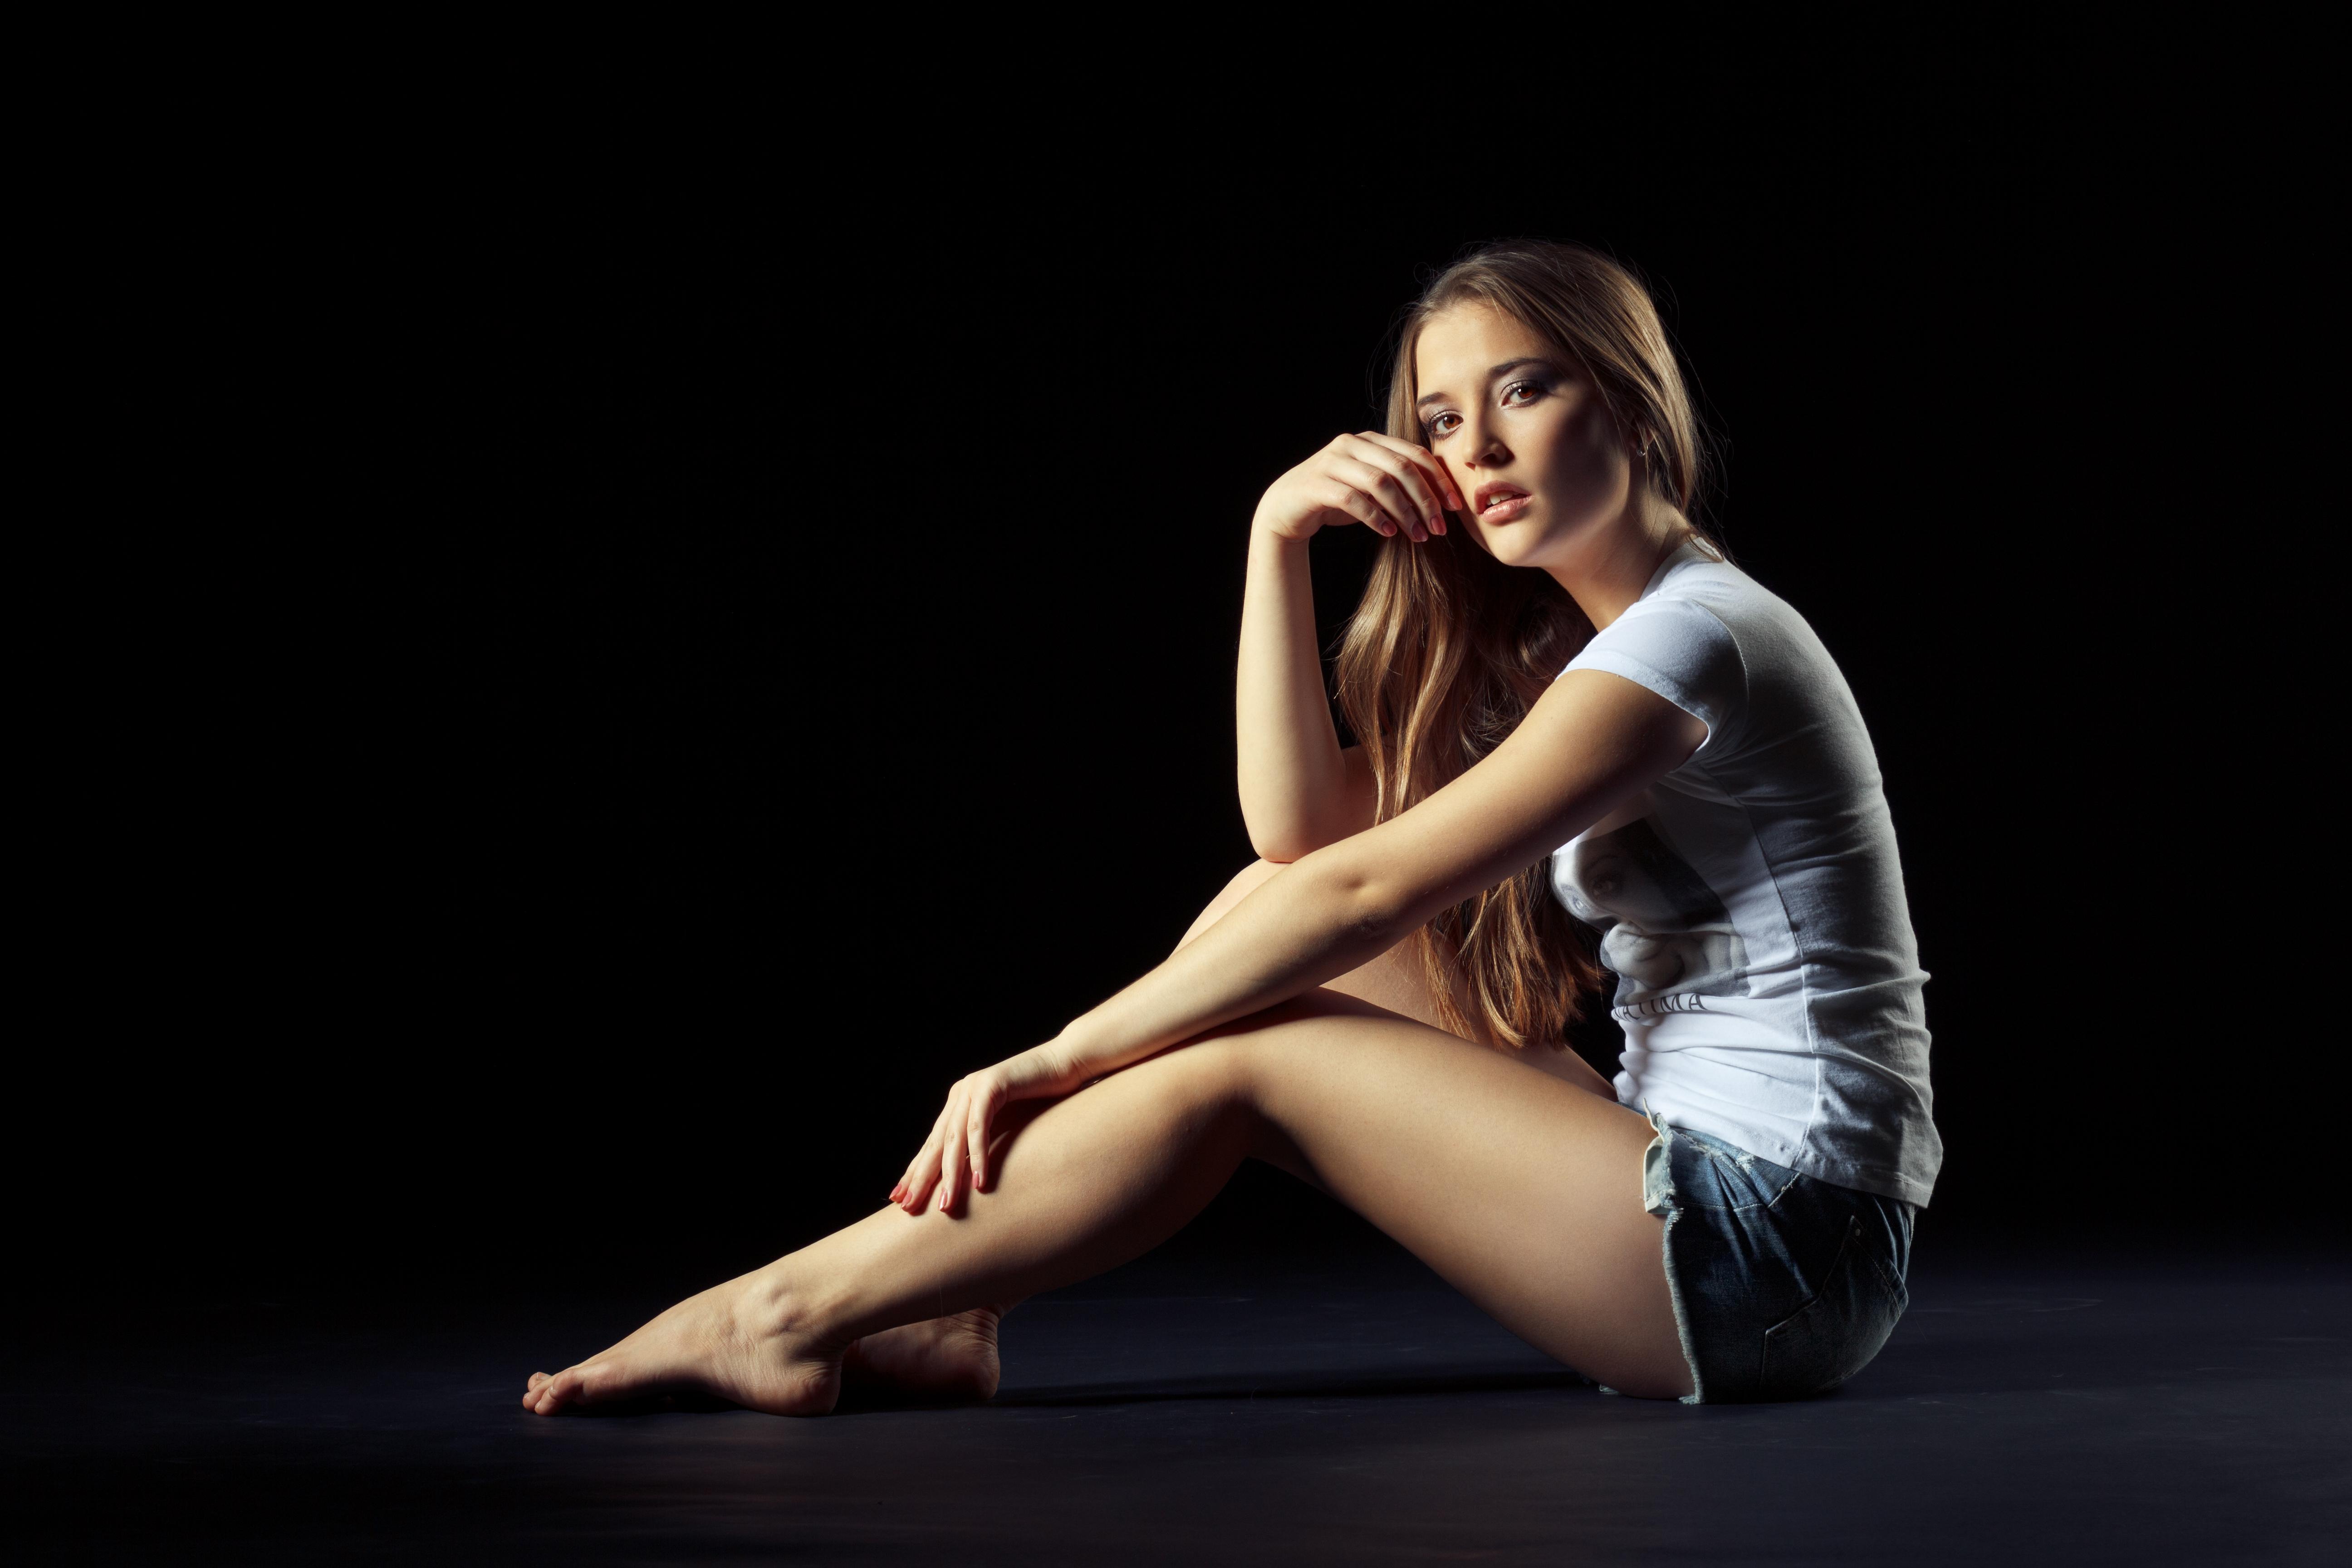 Sexy blonde dance belles louboutin